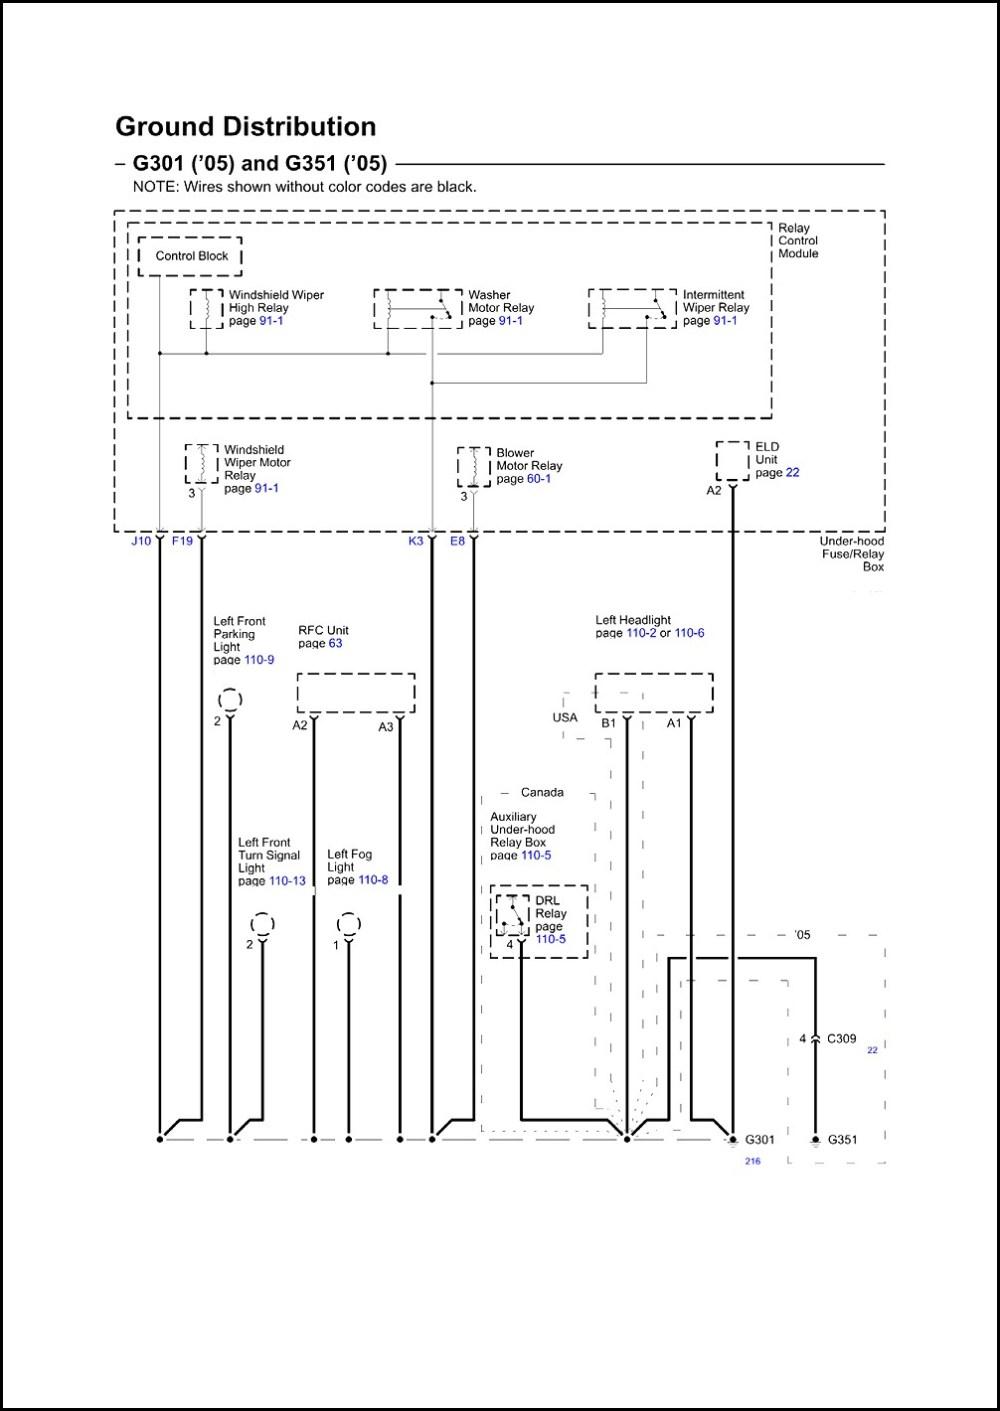 medium resolution of 110 block rj45 wiring diagram wiring diagram u2022 rh 144 202 50 143